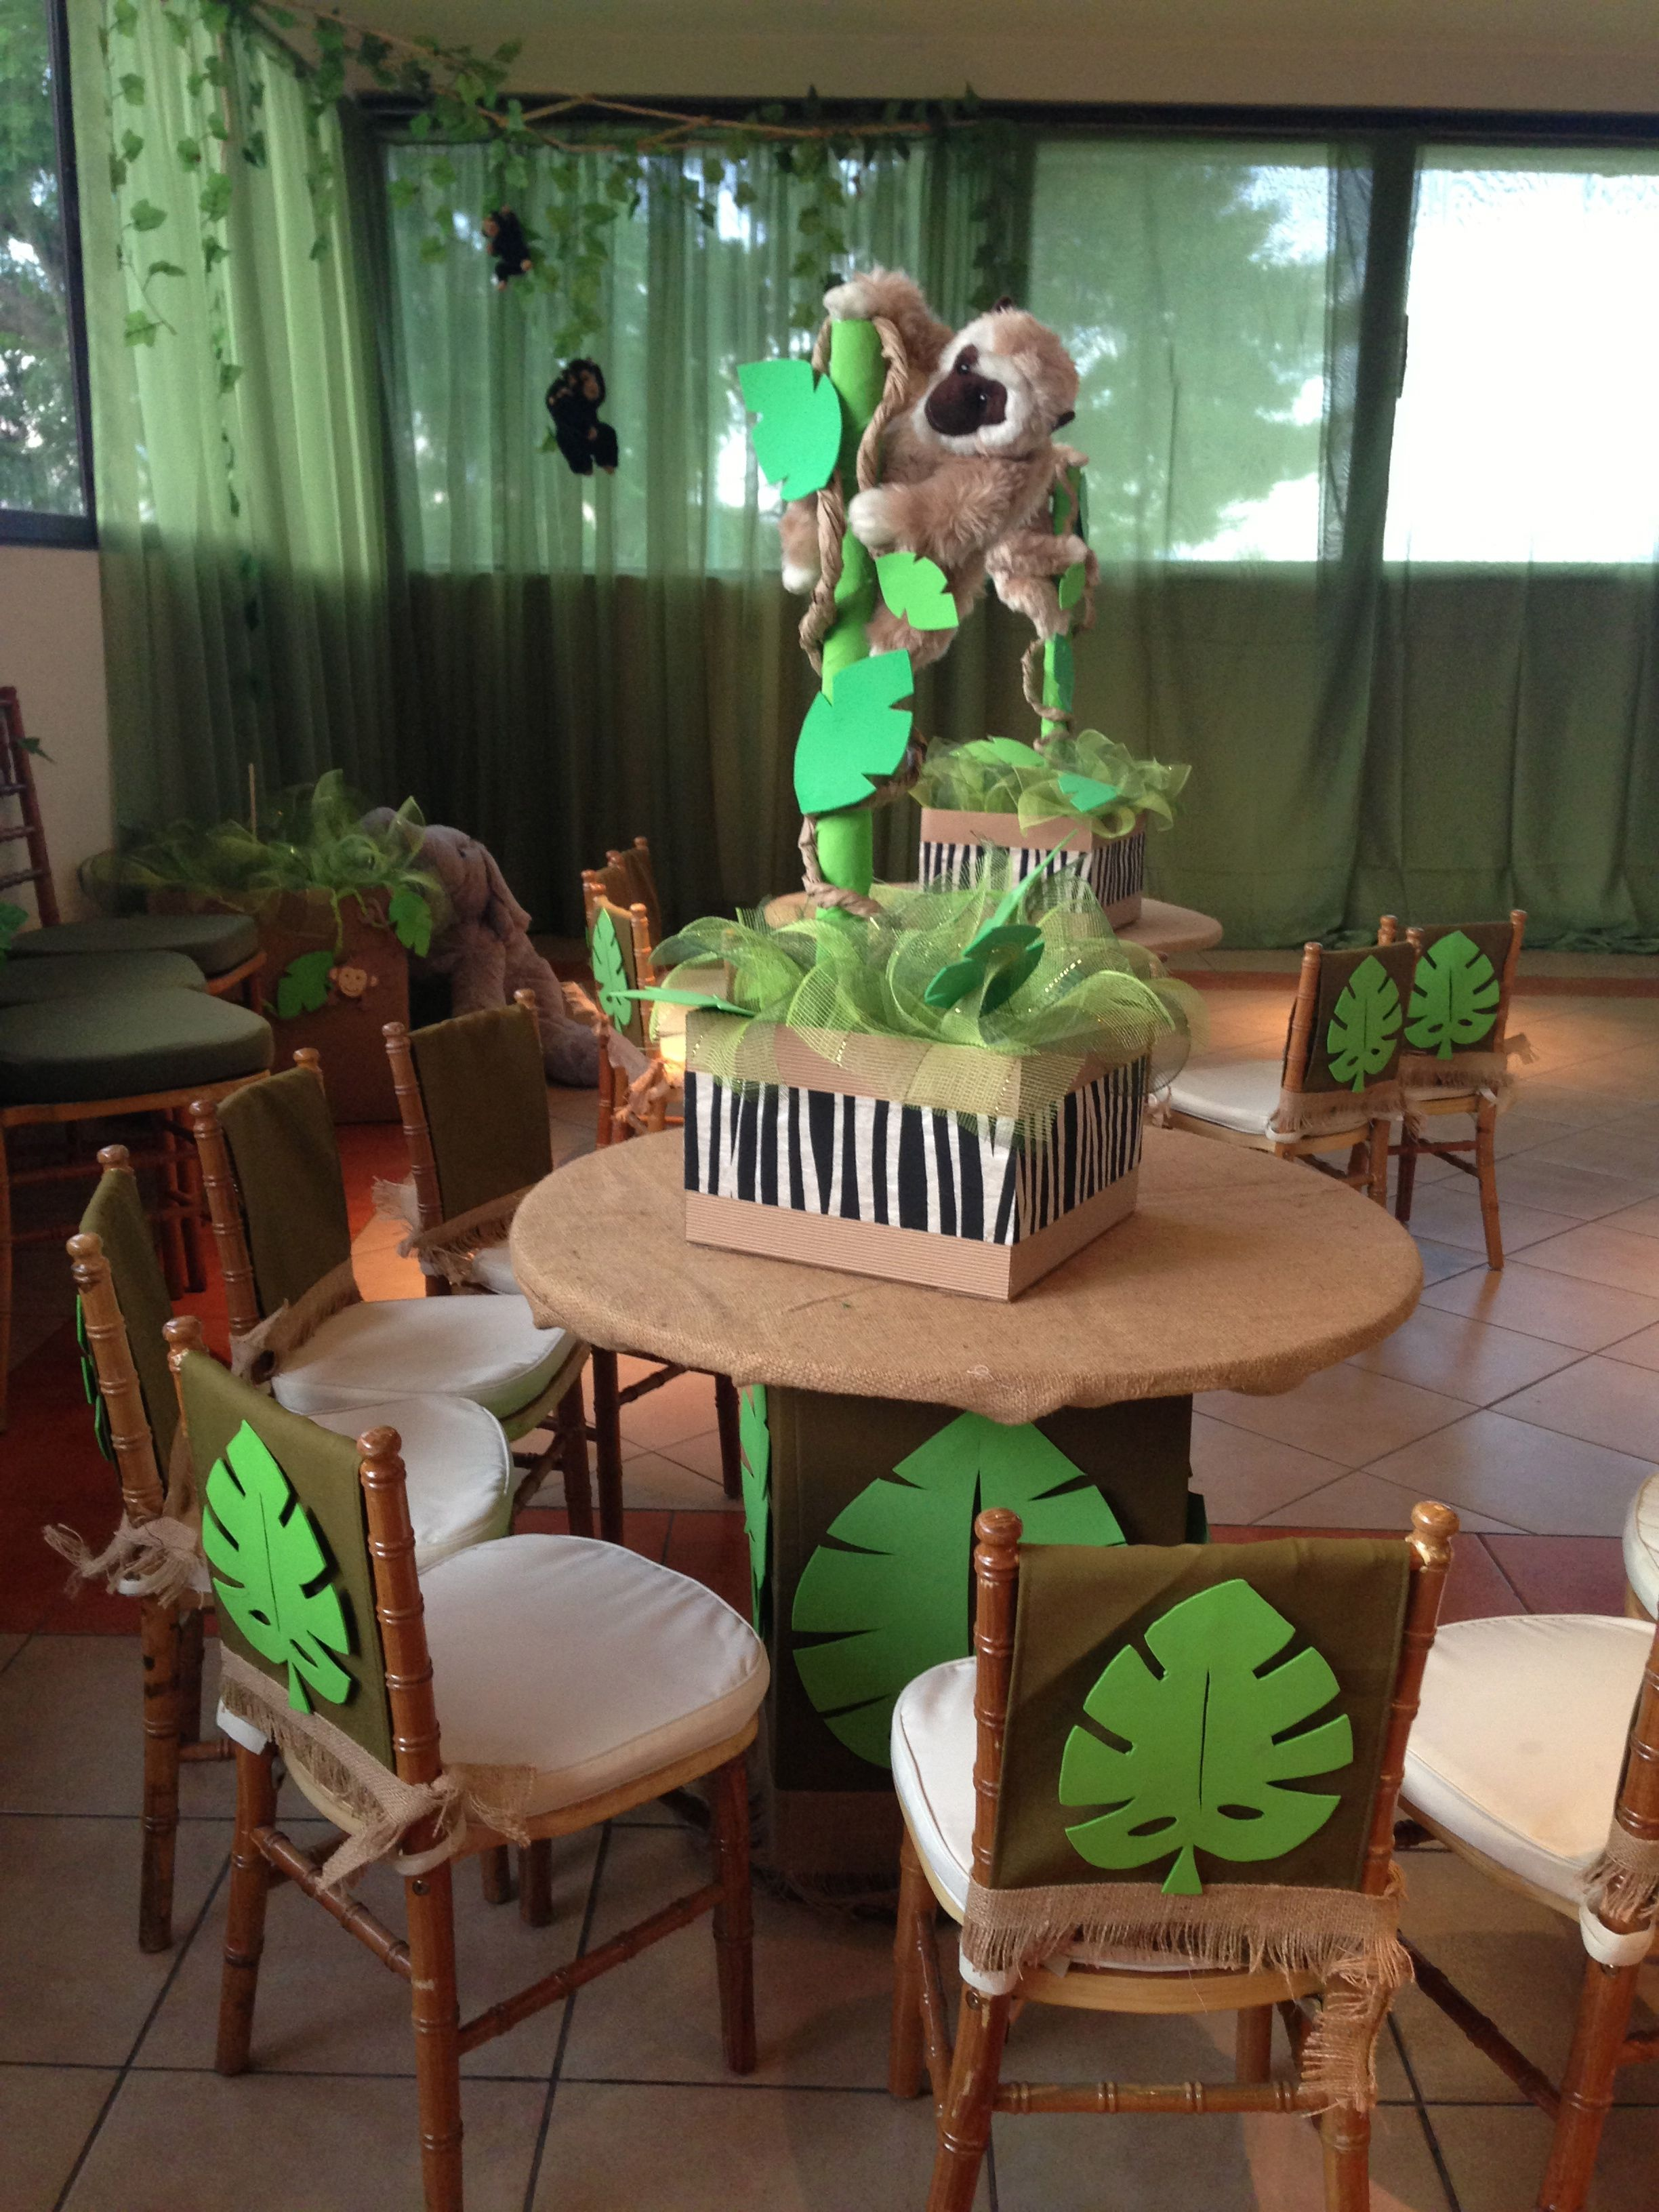 Decoracion infantil fiesta jungla eventos by bsquare - Ideas decoracion fiestas ...